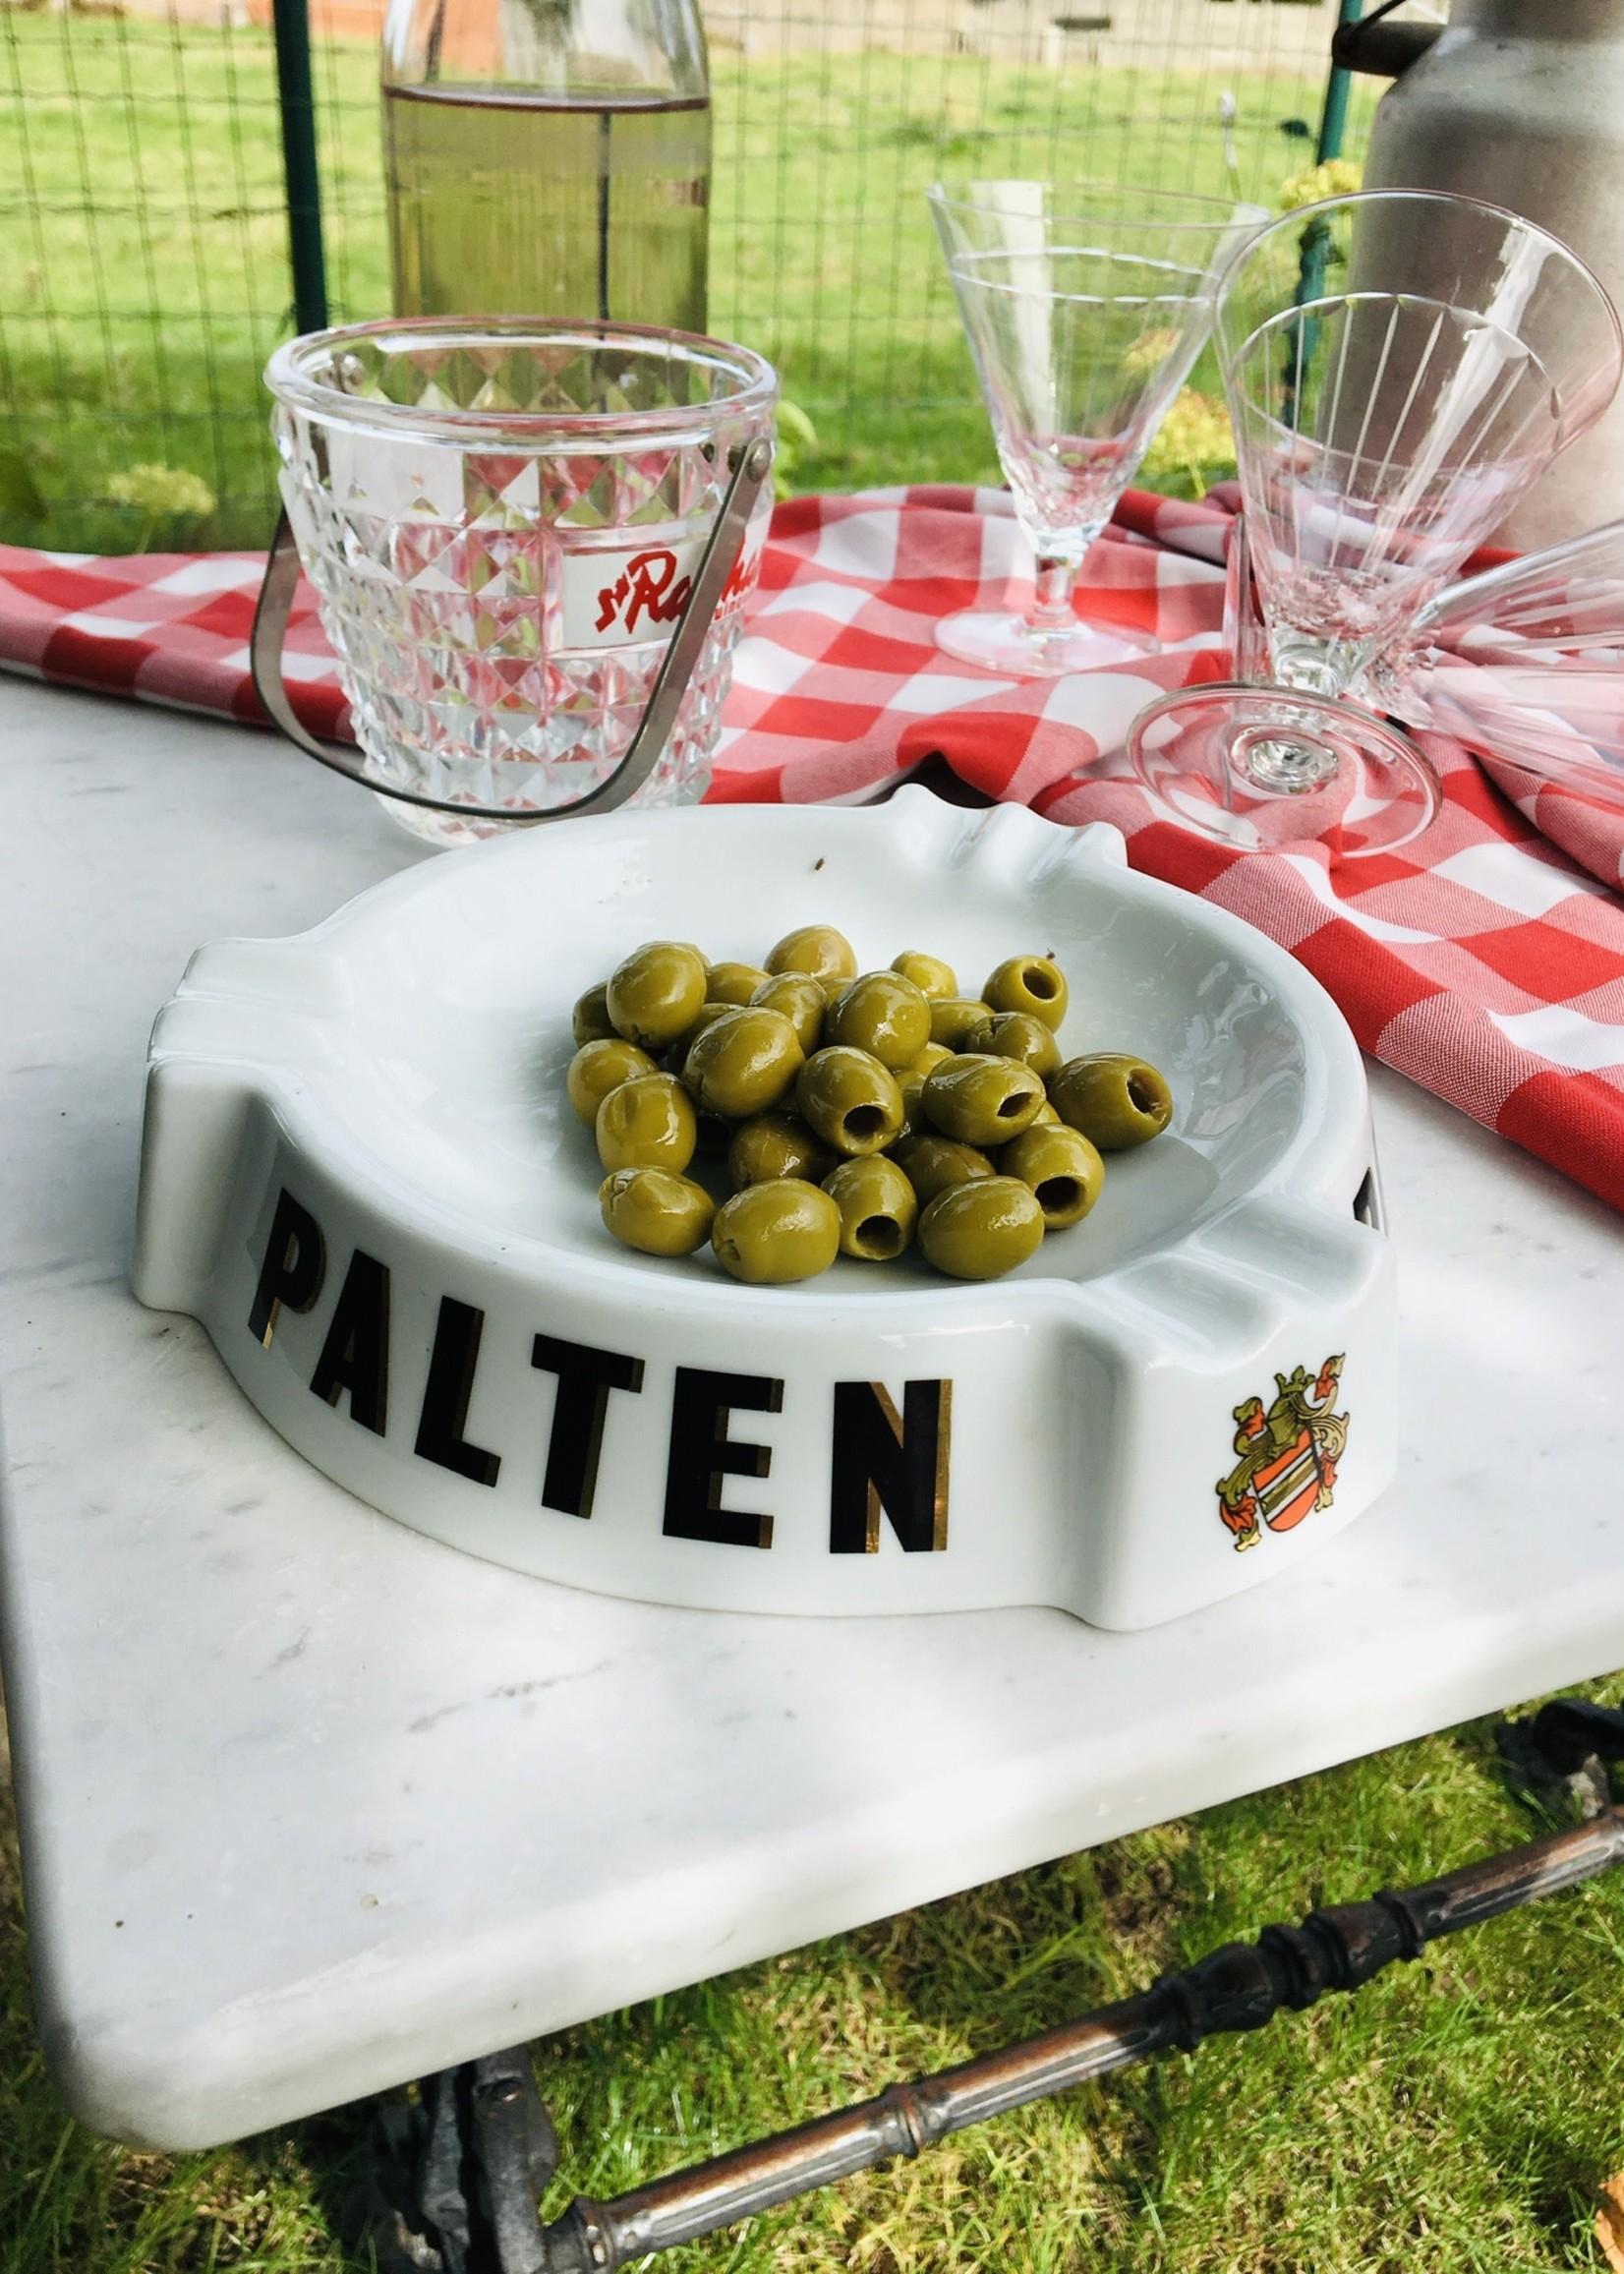 Palten ceramic ashtray with gold design